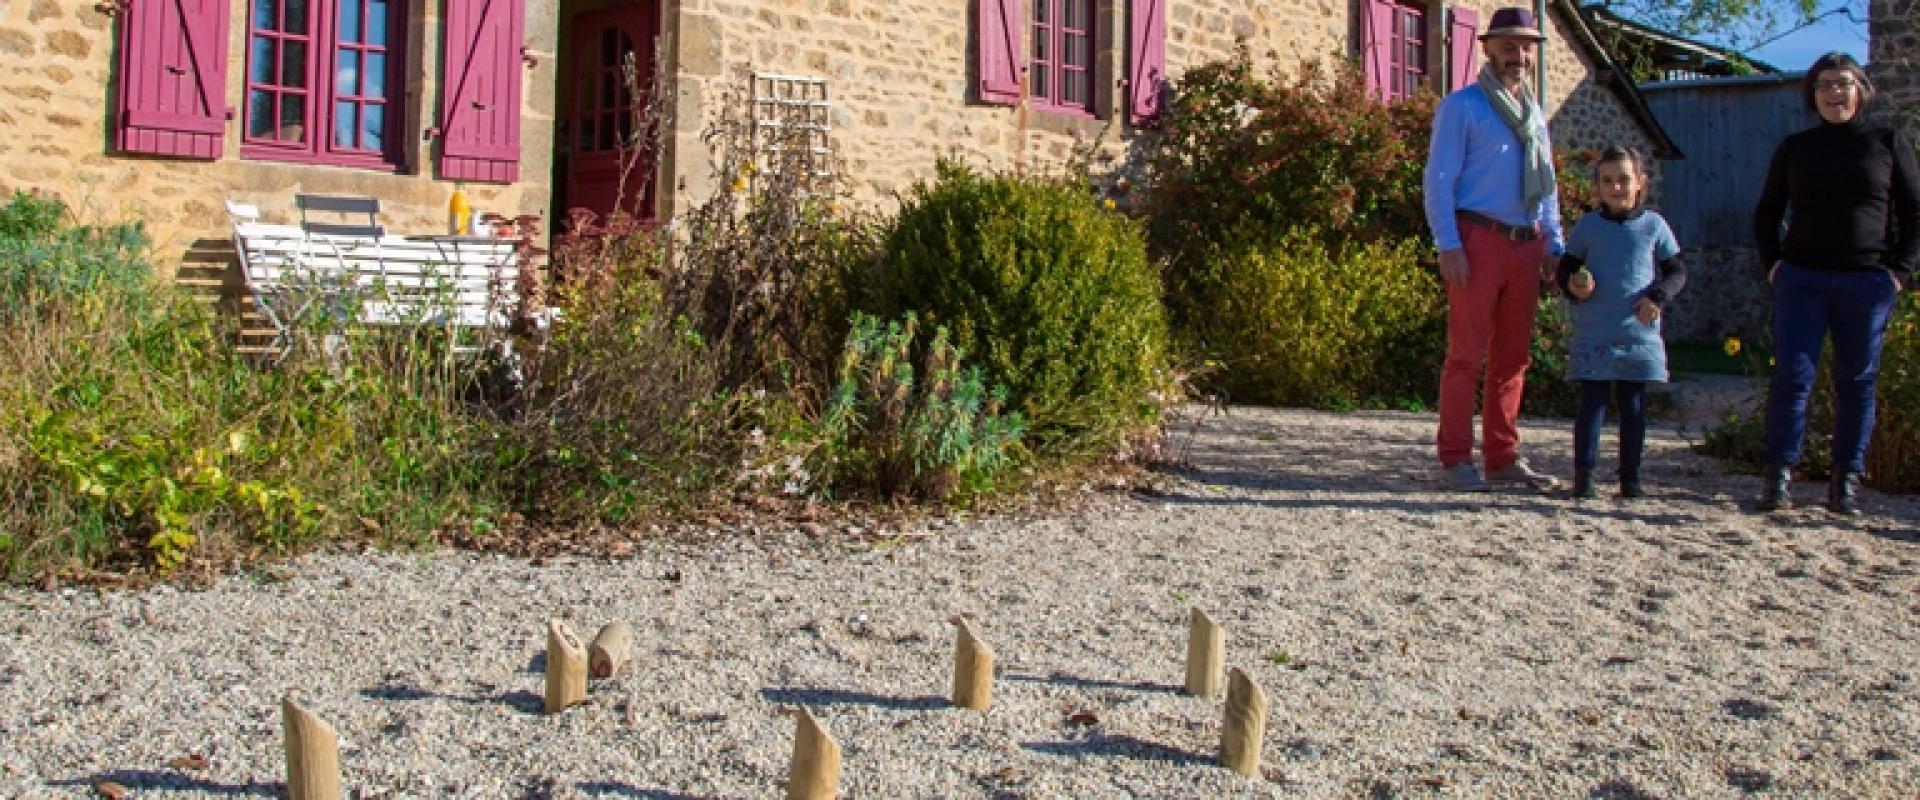 Gîte du Clos Huet à Mézangers en Mayenne